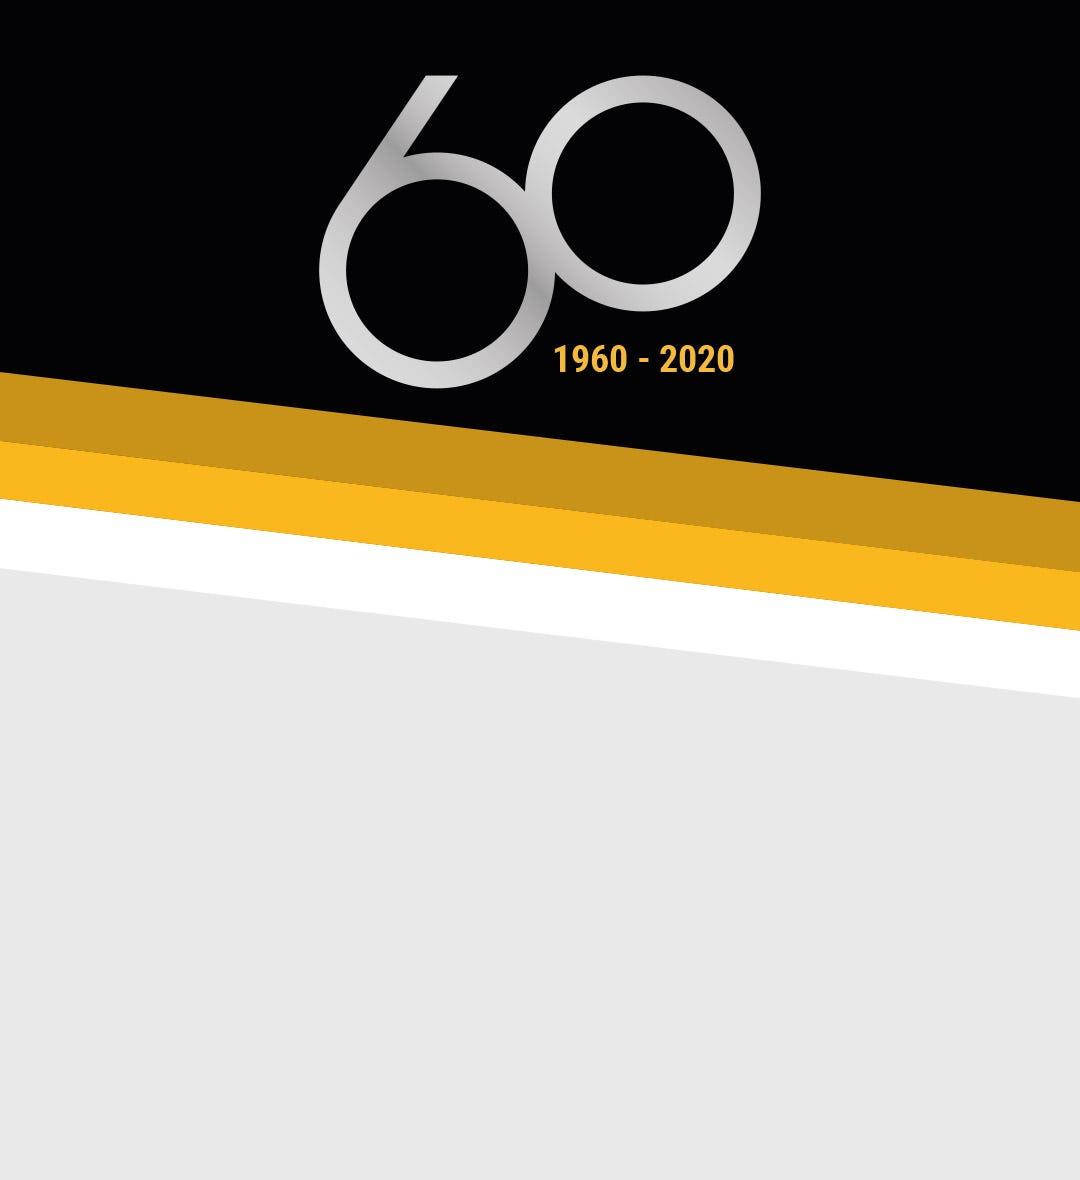 The Italian brand Alpina celebrates its 60th anniversary